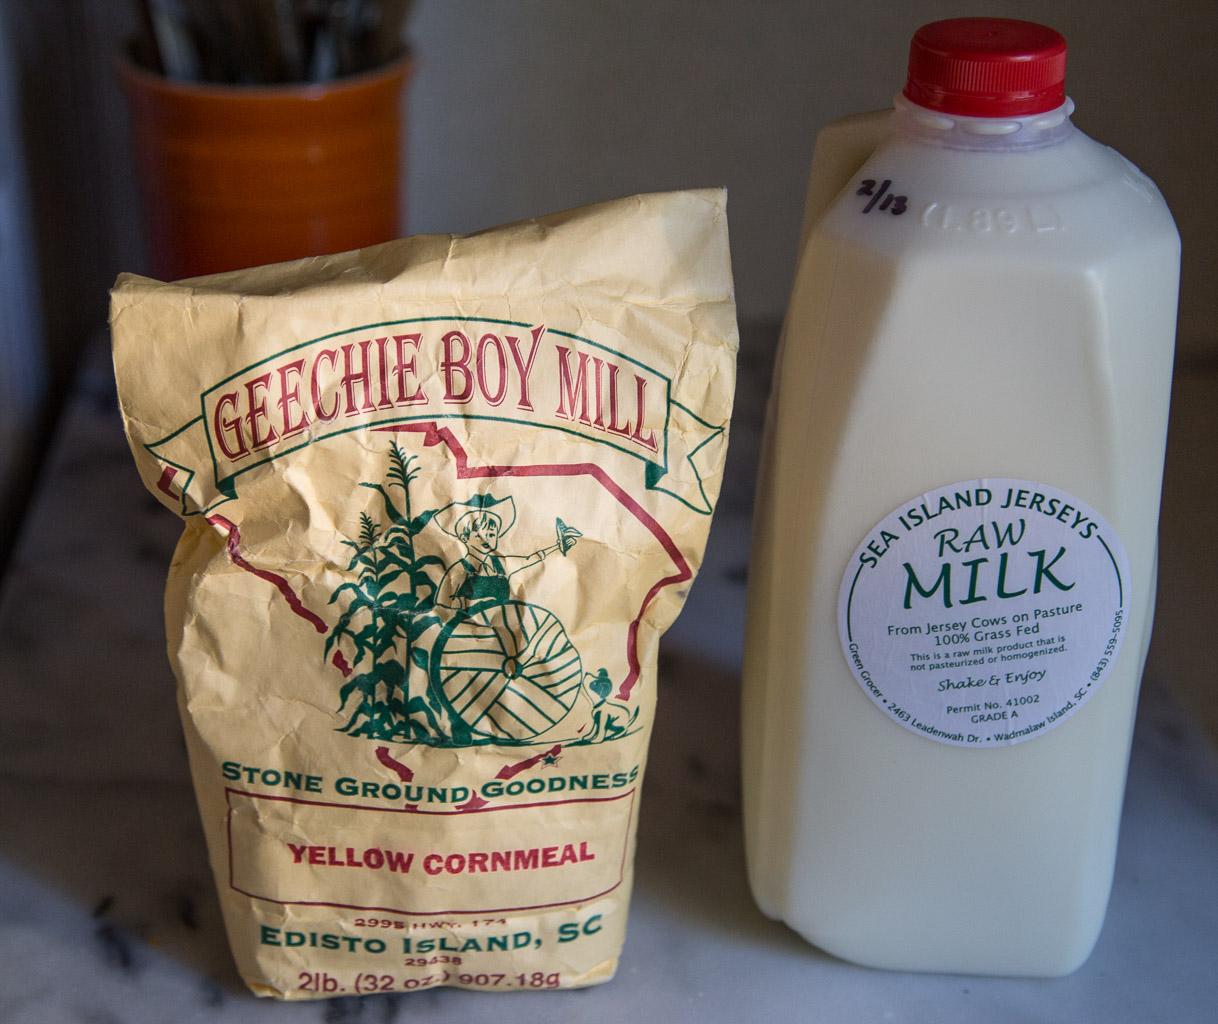 Geechie Boy cornmeal  and Sea Island Jerseys Raw Milk